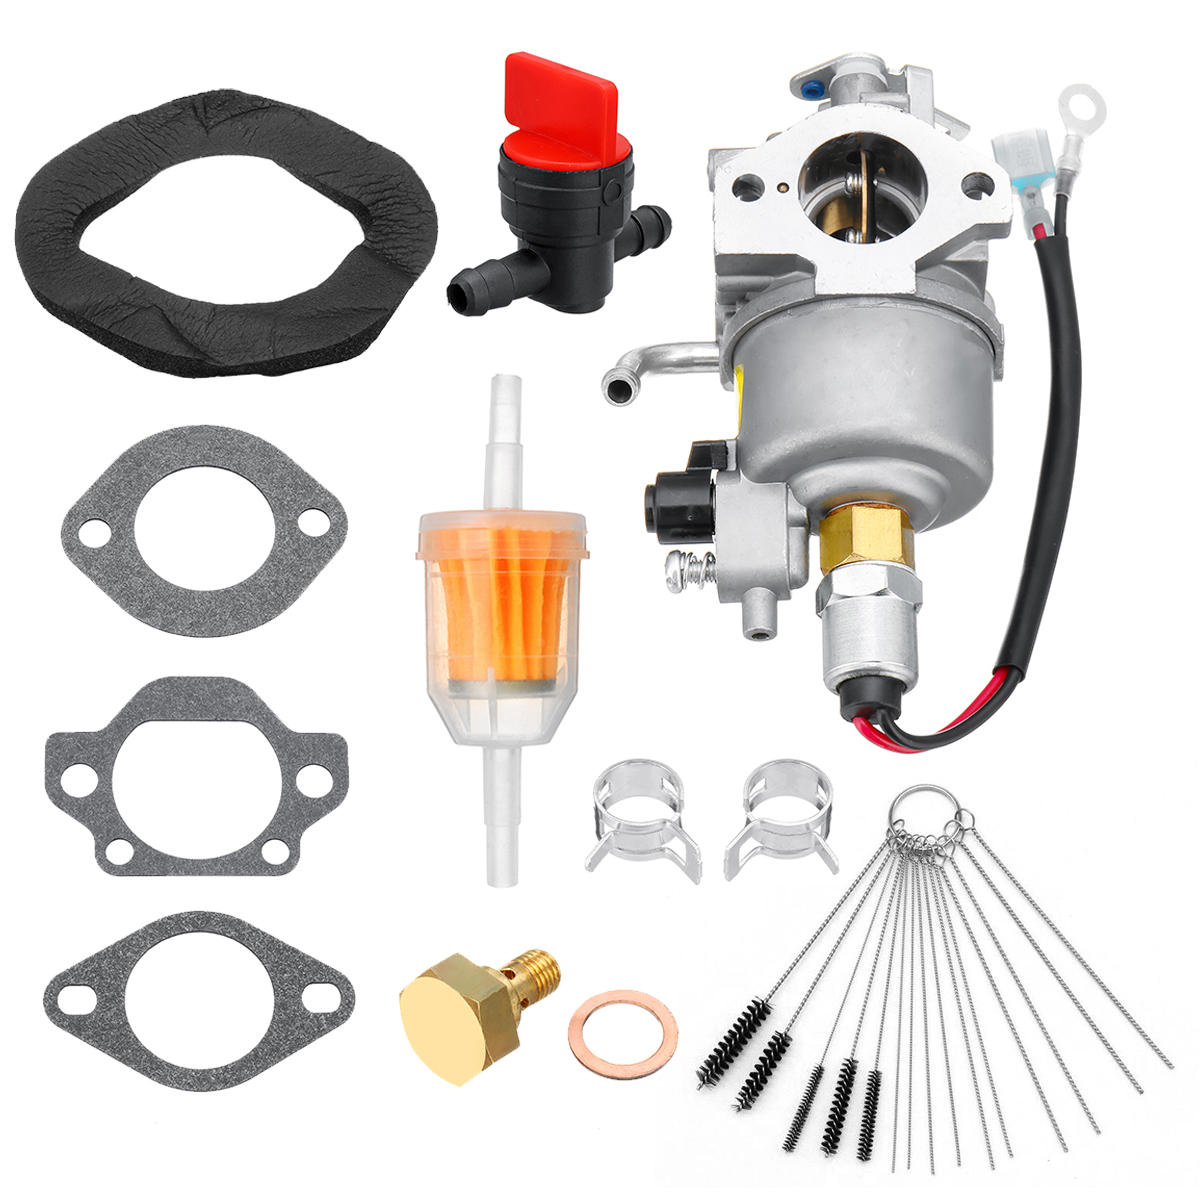 hight resolution of carburetor gasket kit for onan cummins a041d736 microquiet 4000 watt 4kyfa26100 generators cod